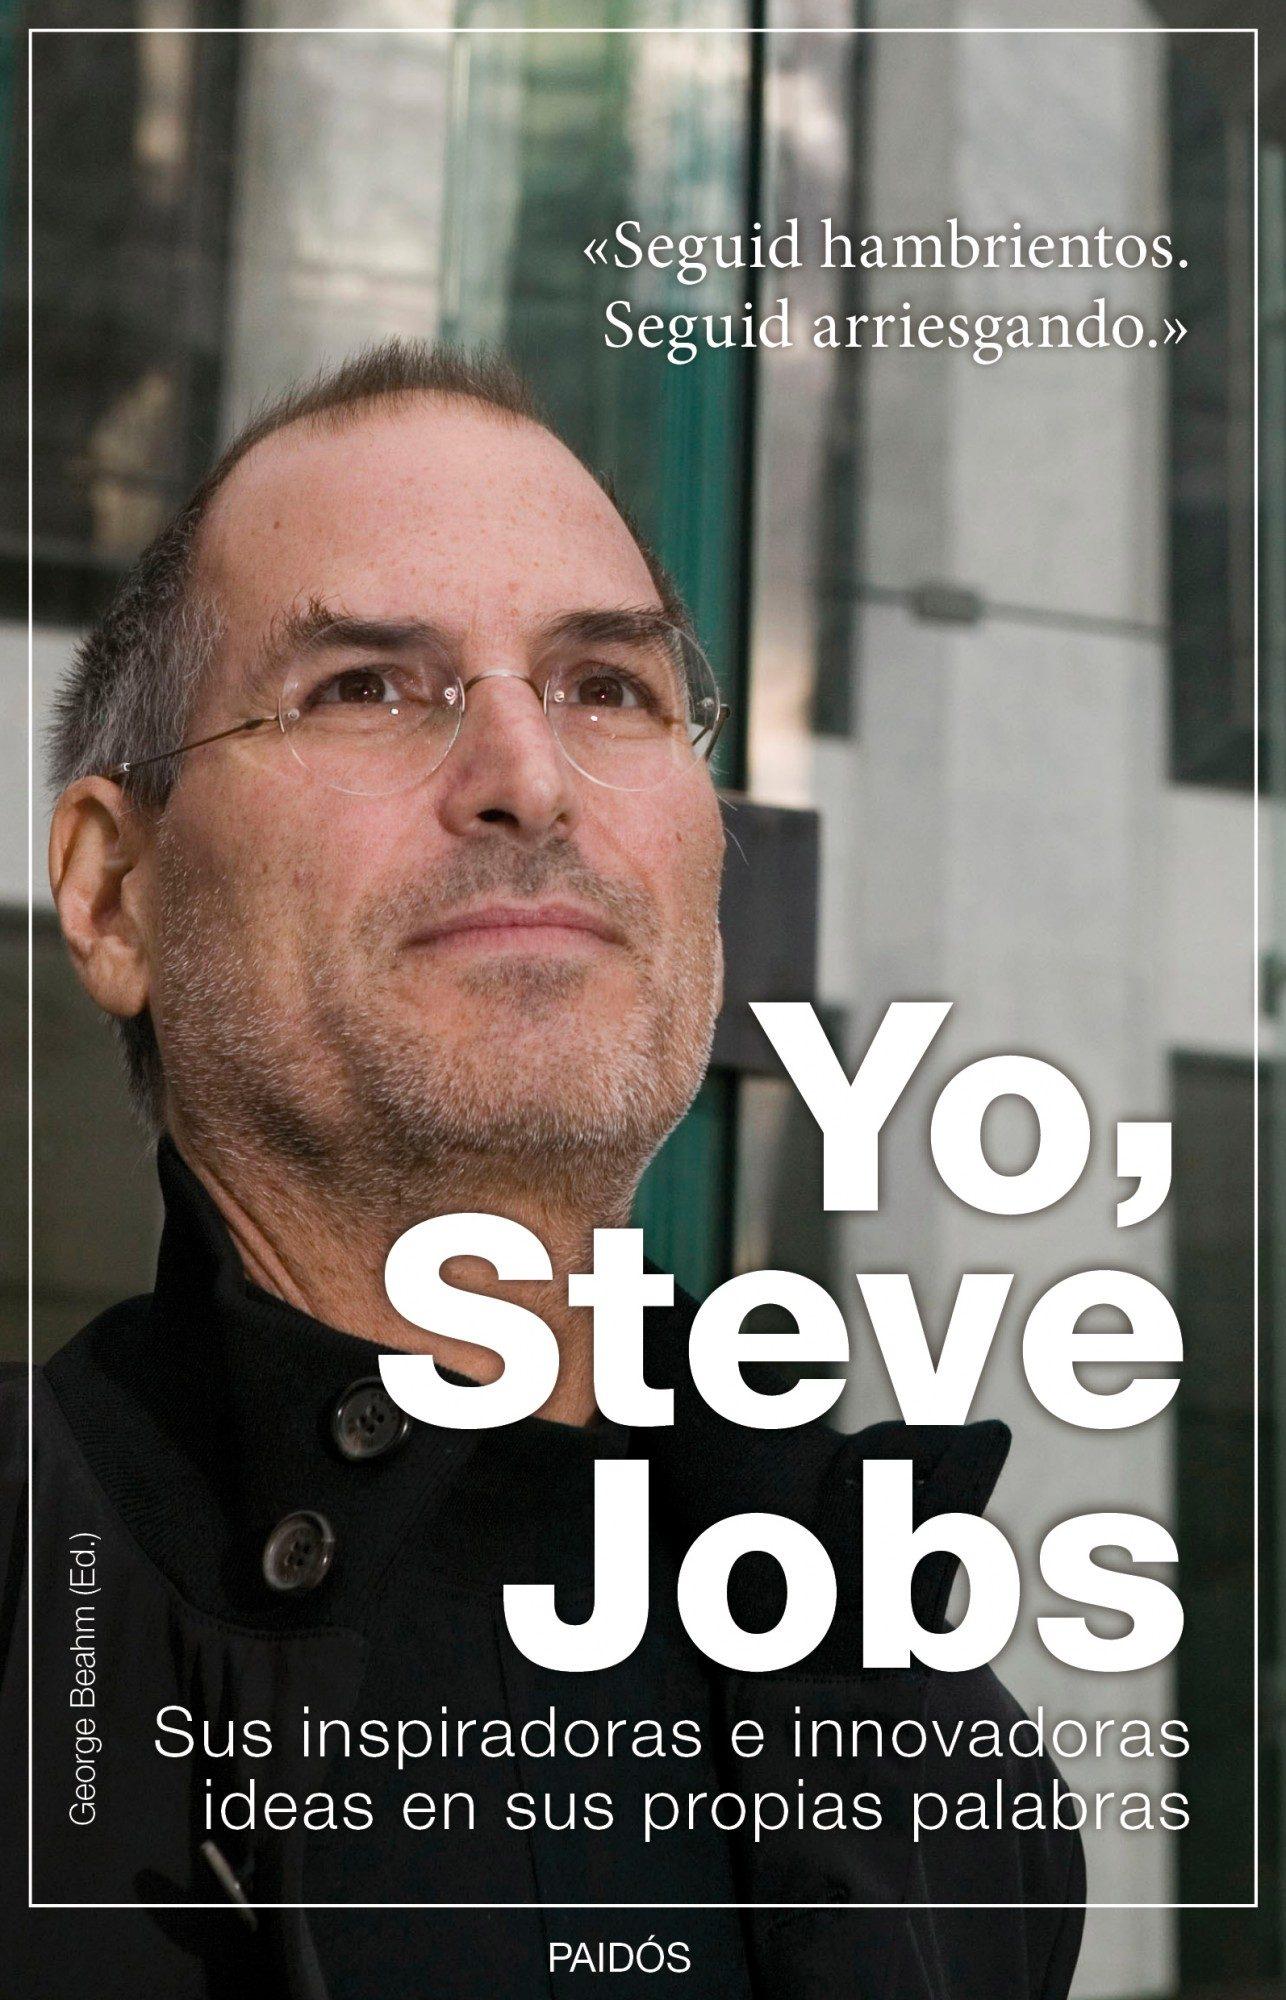 Yo Steve Jobs Ebook George Beahm Descargar Libro Pdf O Epub